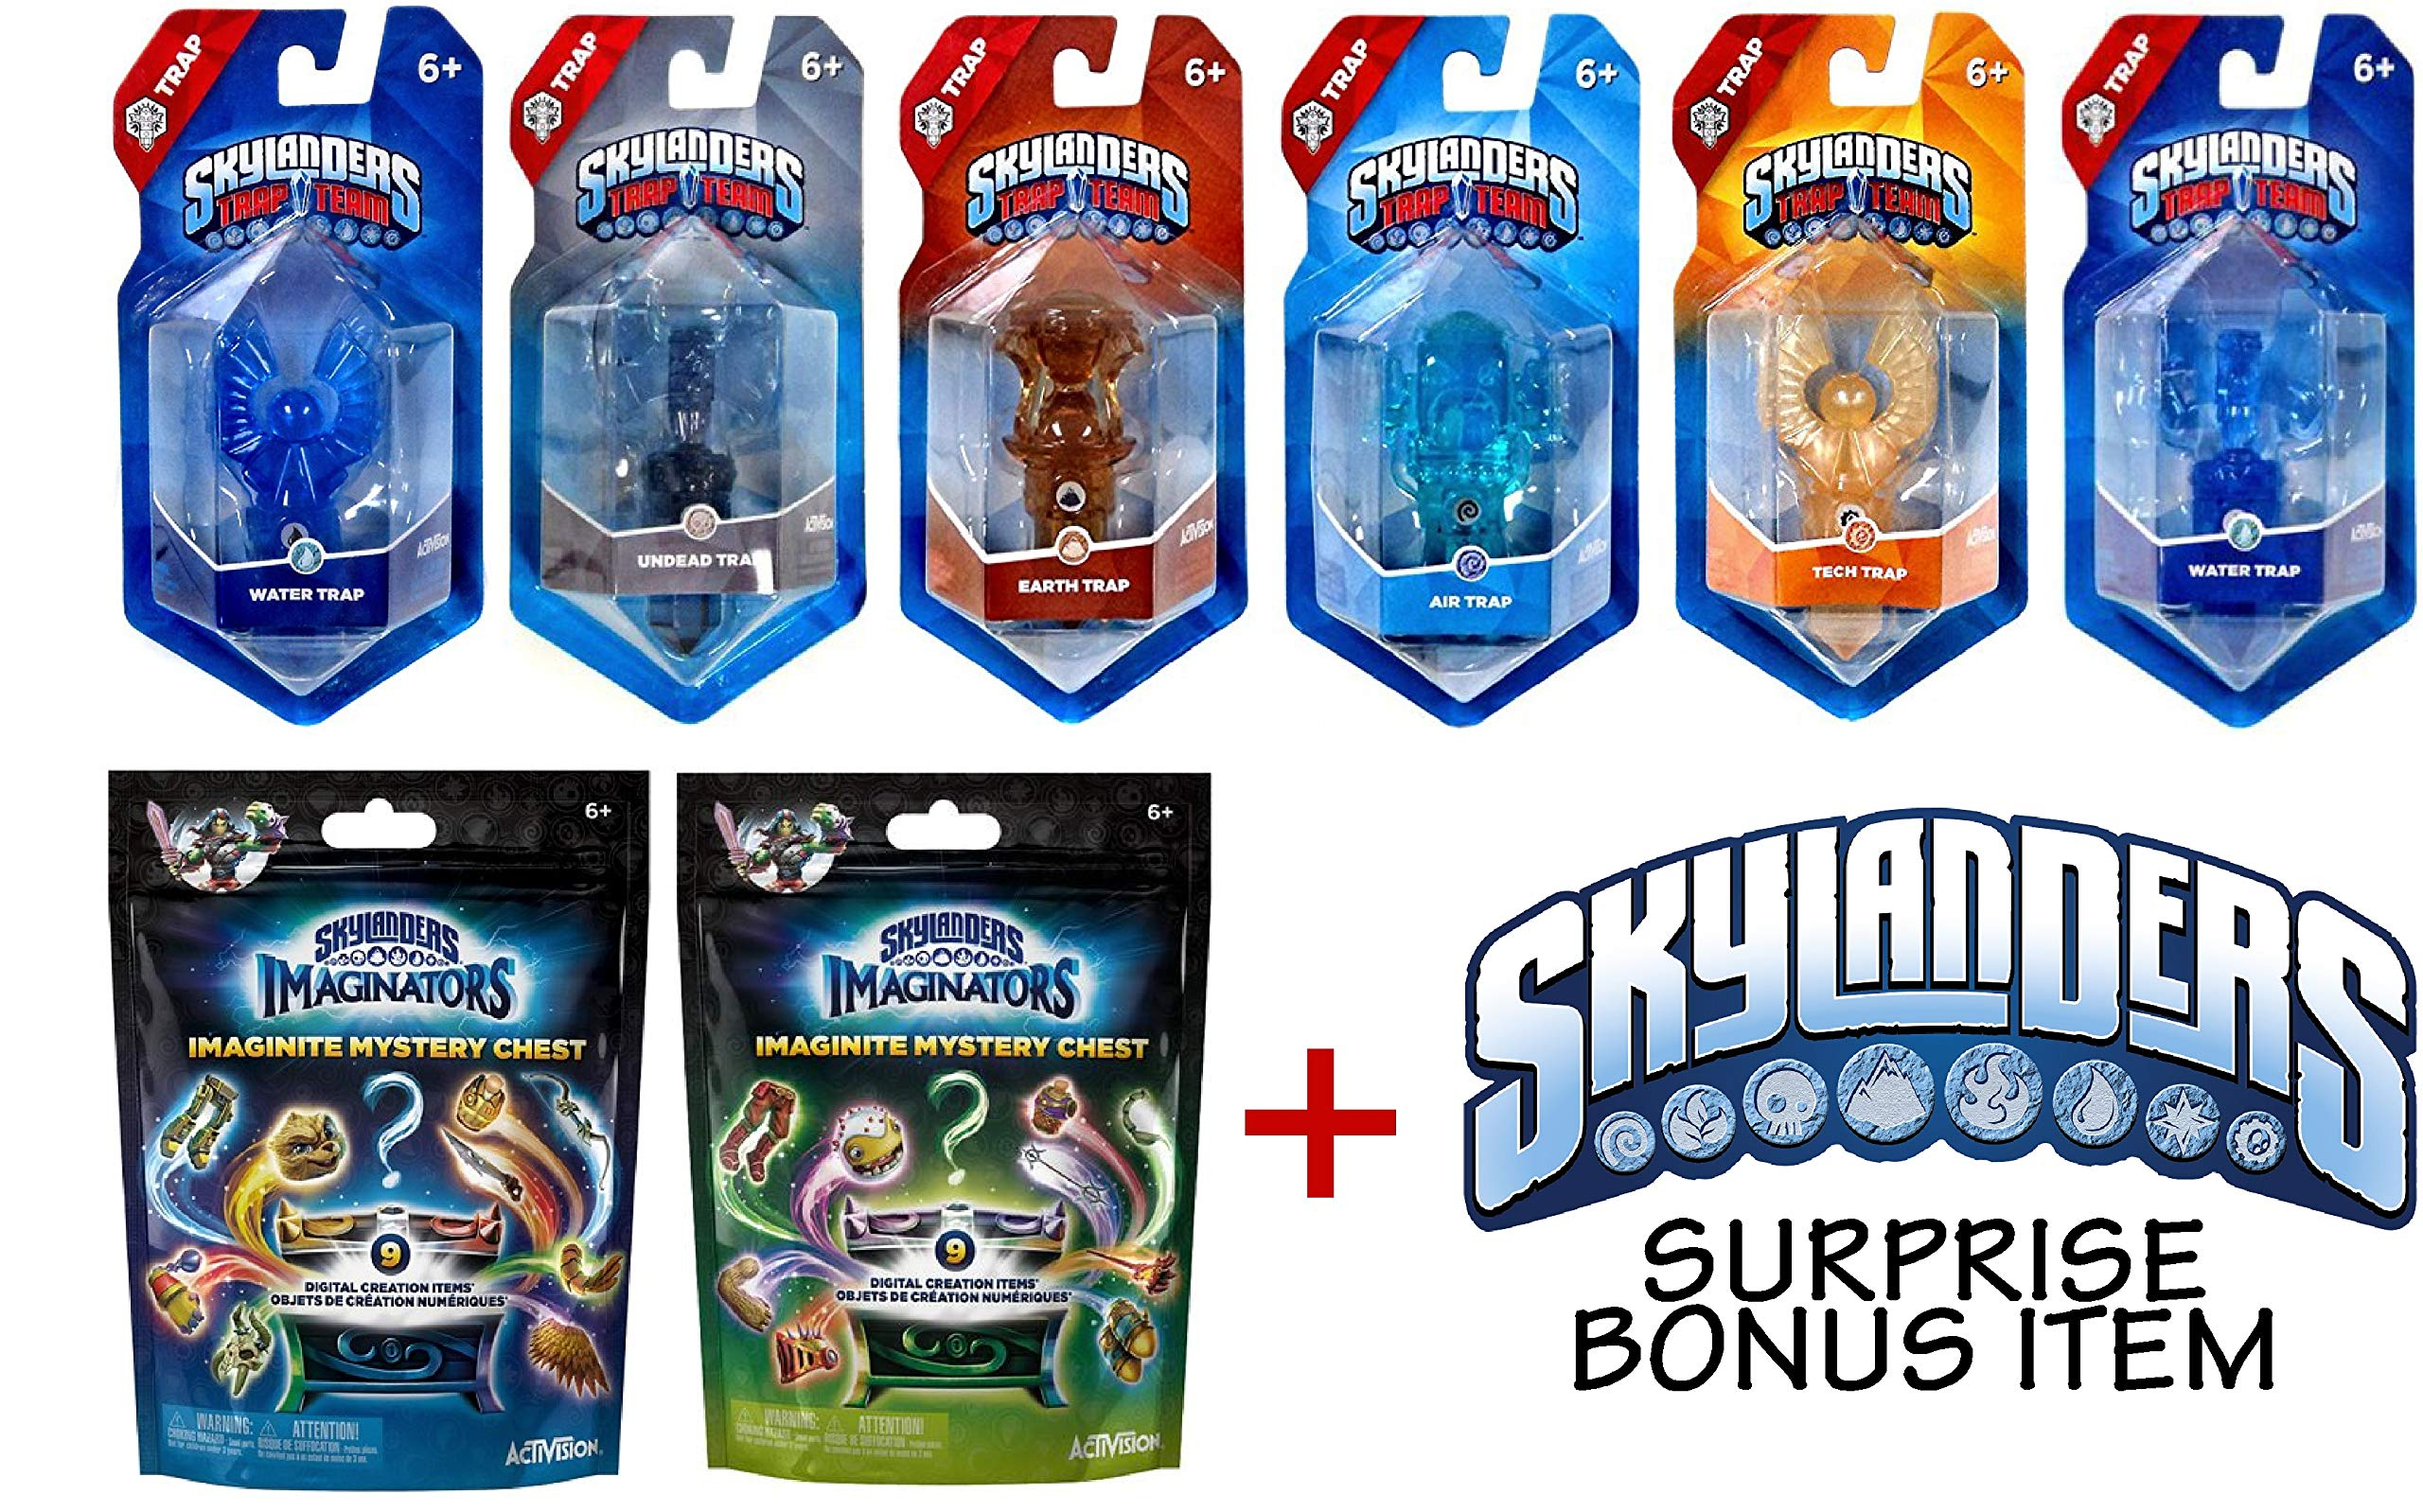 TRAP TEAM Skylanders Bundle Set of 6 Crystals Rare, 2 IMAGINATORS CHESTS Packs & Bonus Item - WiiU PS4 Xbox 360 ONE